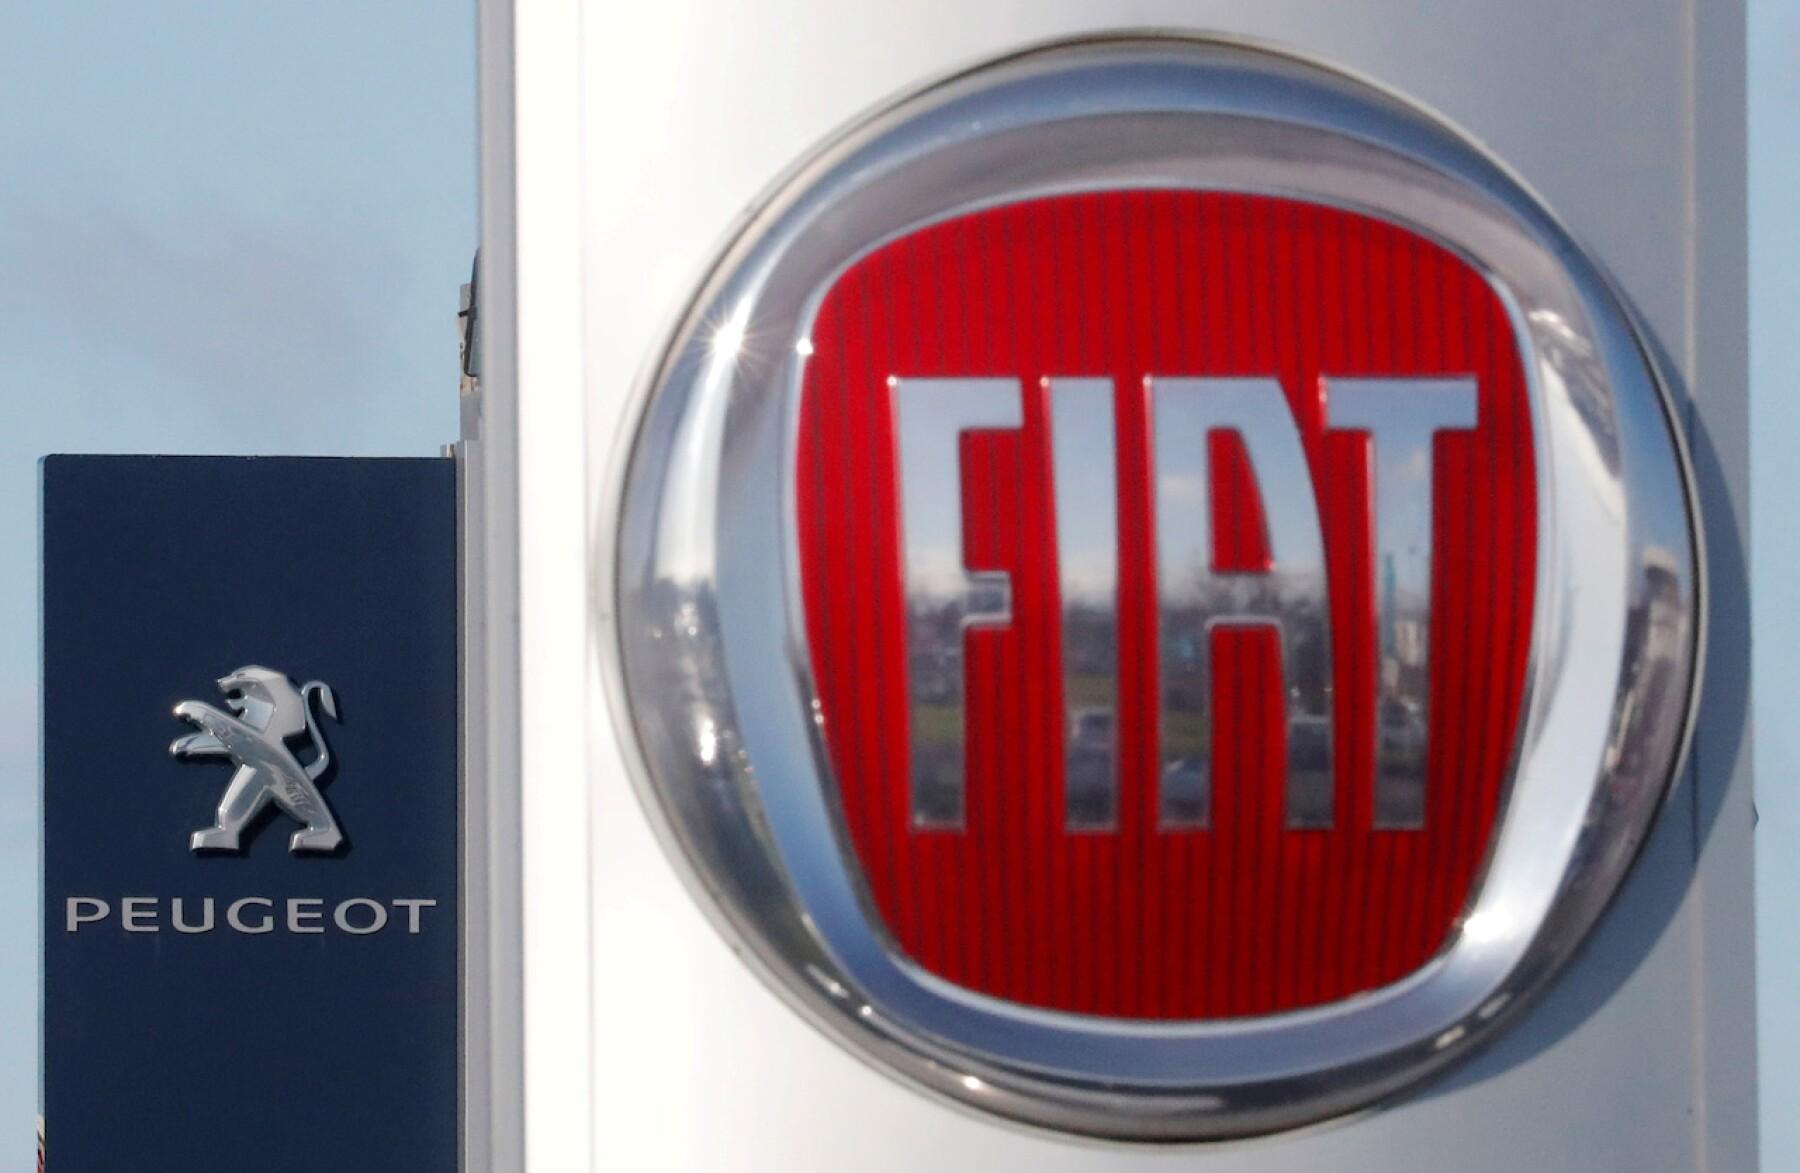 Fiat peugeot